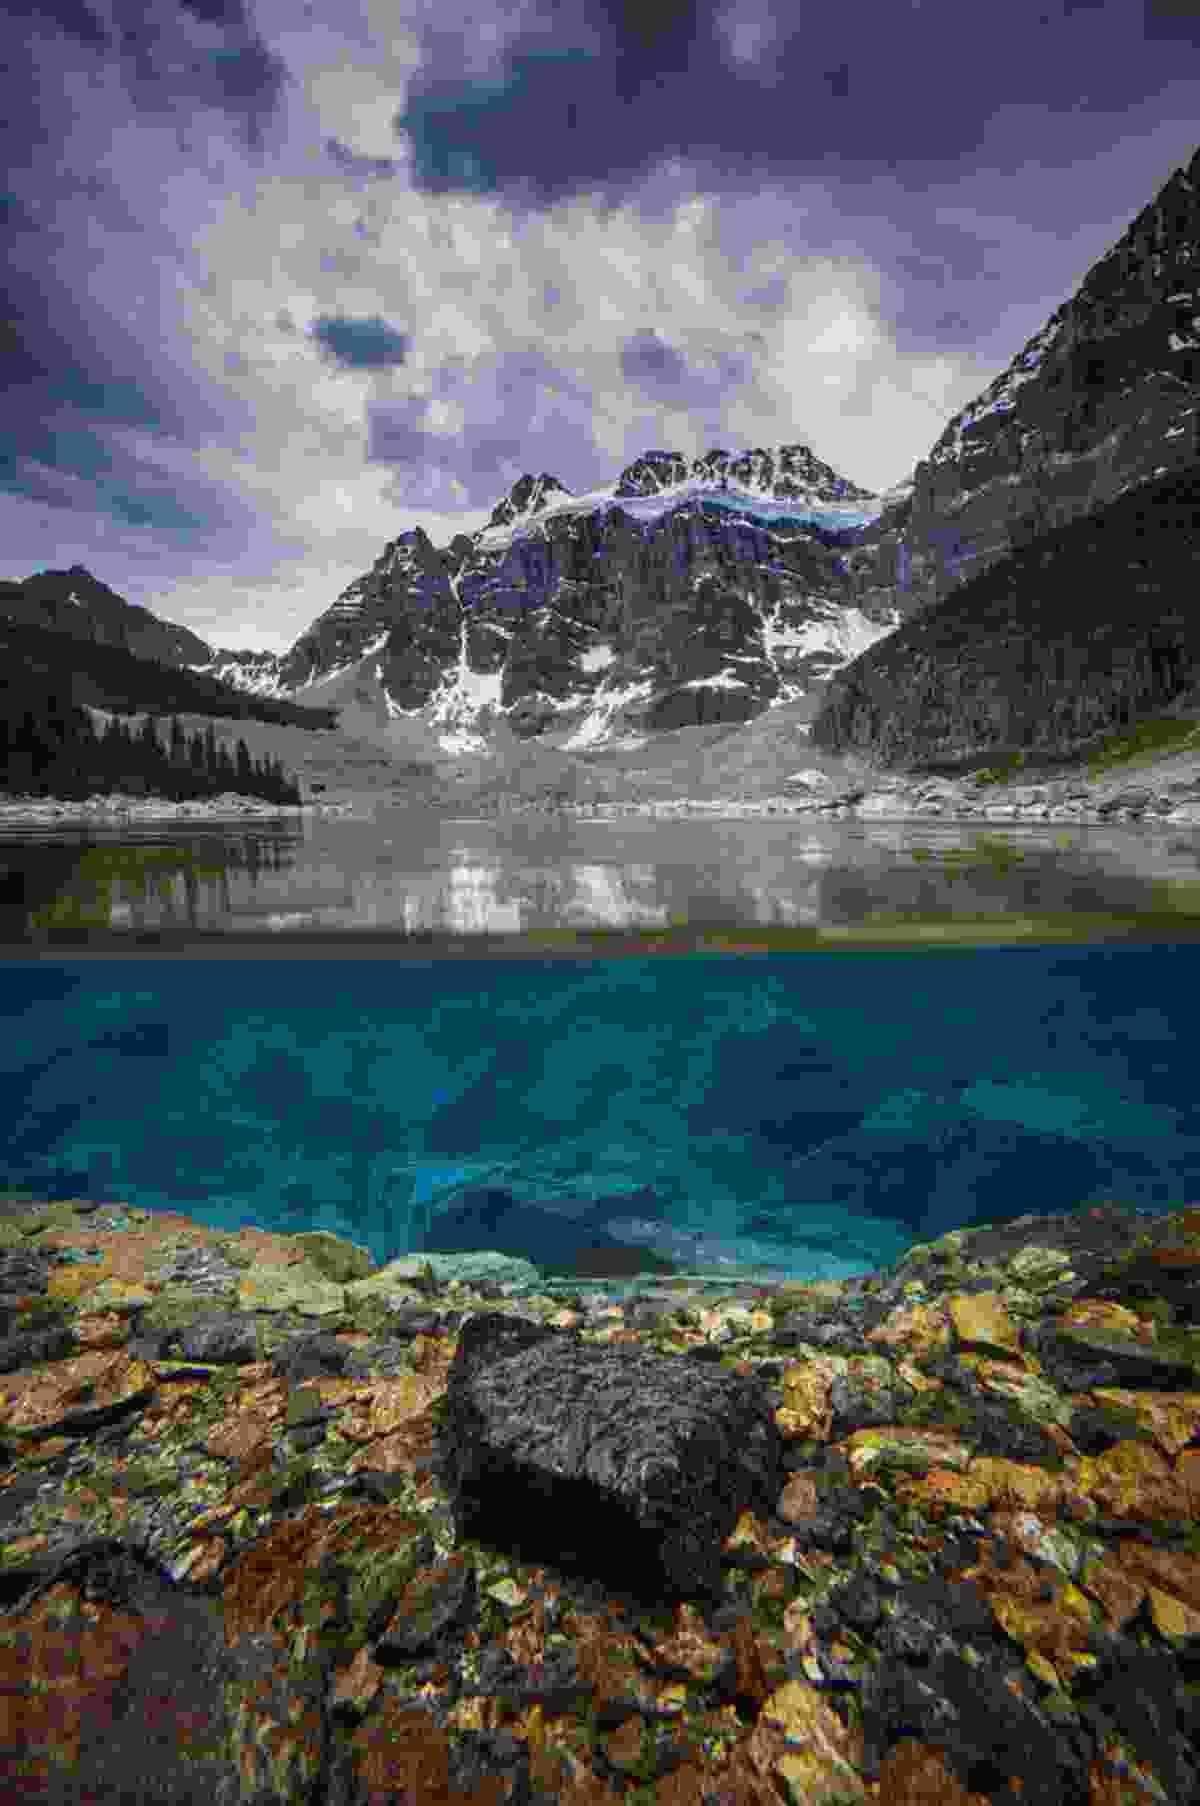 Underwater Colours of Consolation Lakes (Paul Zizka)